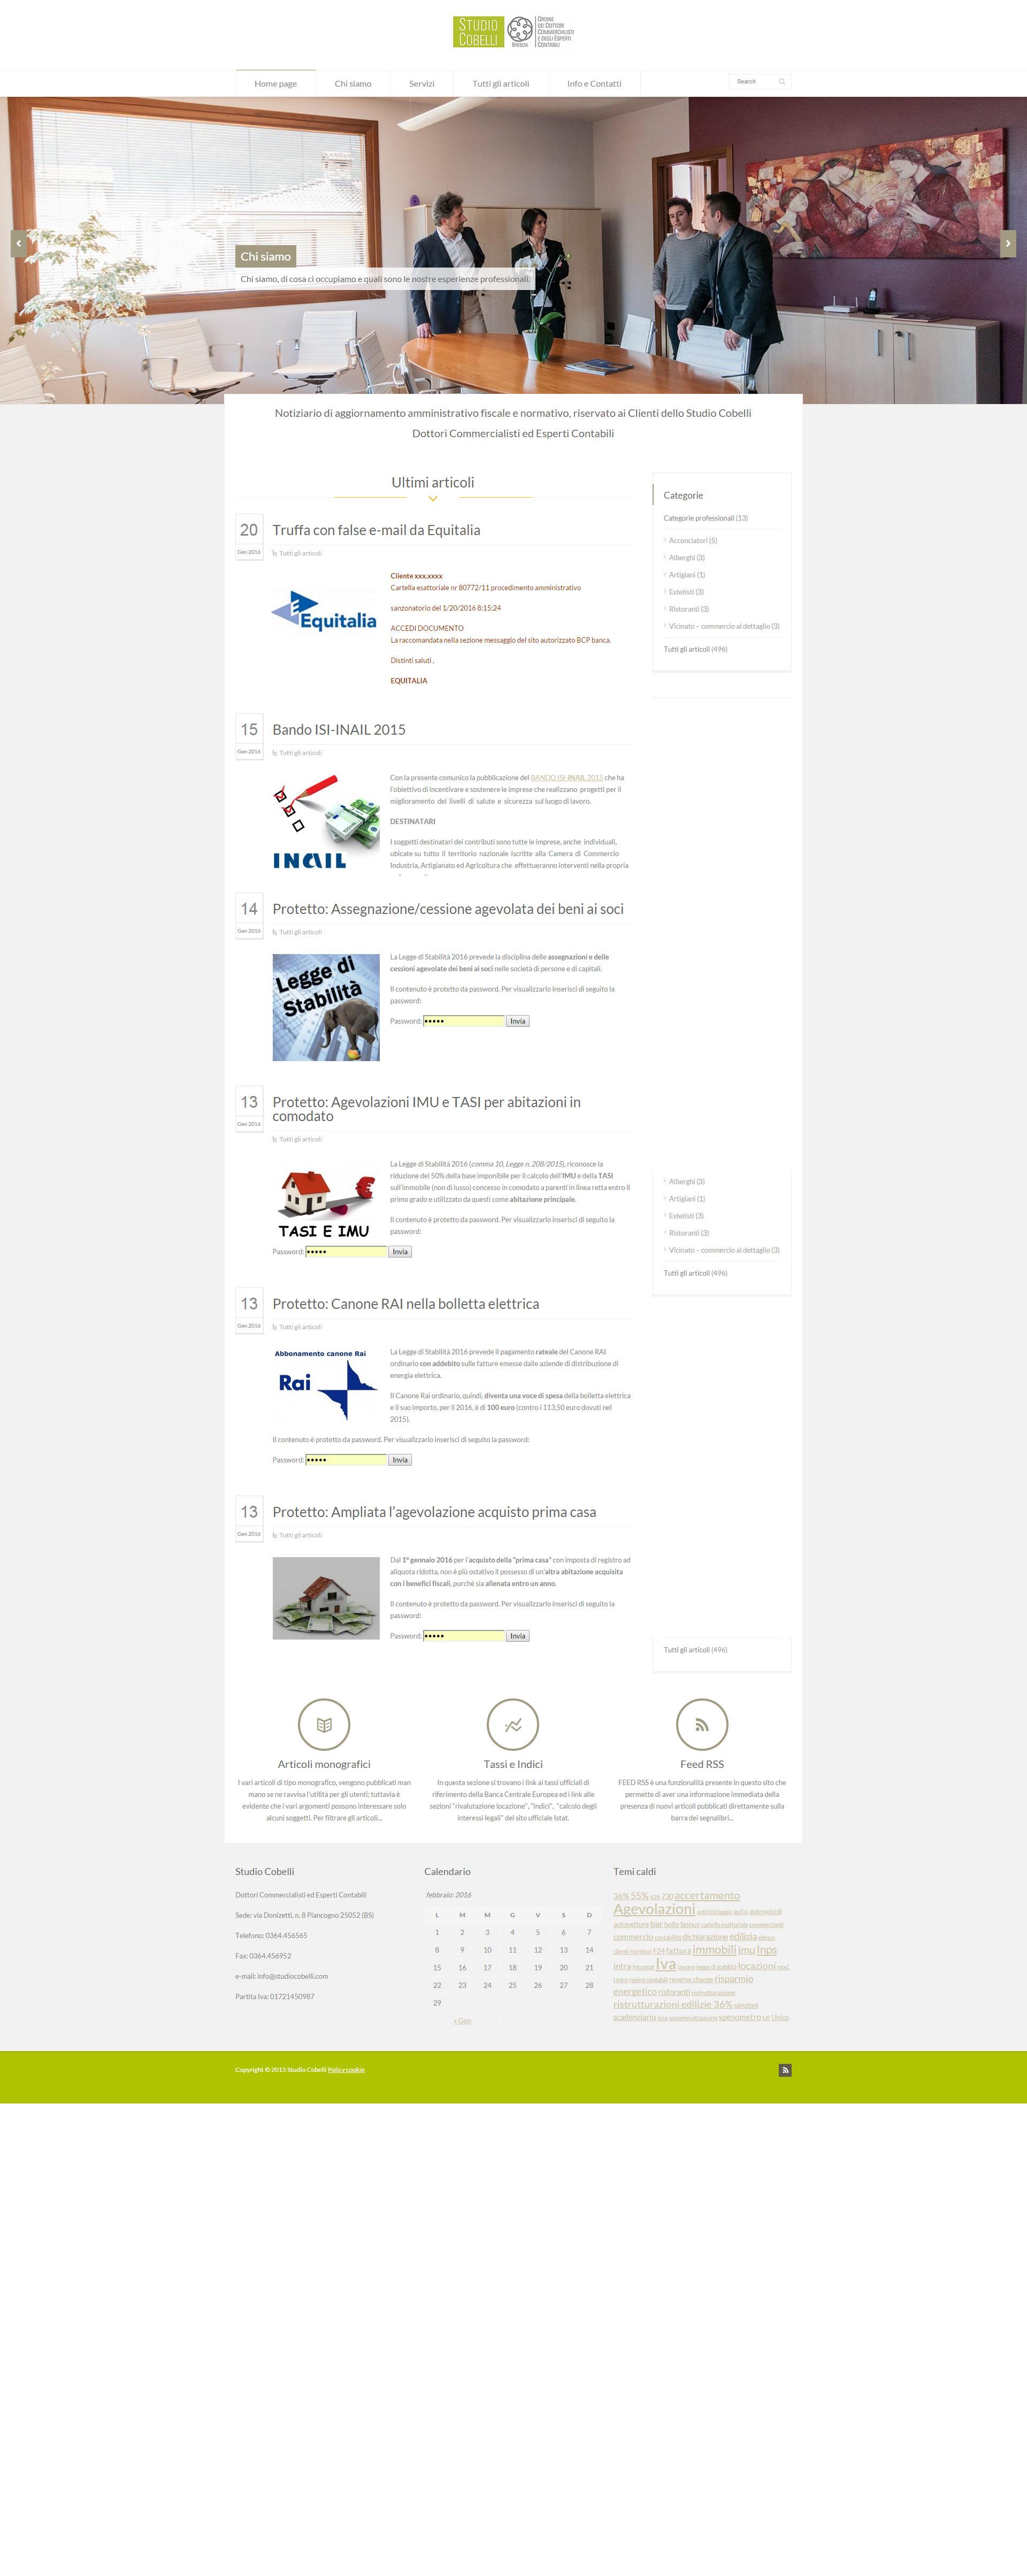 siti-internet-seo-newsletter-social-network-studio-cobelli-contessi-fostinelli